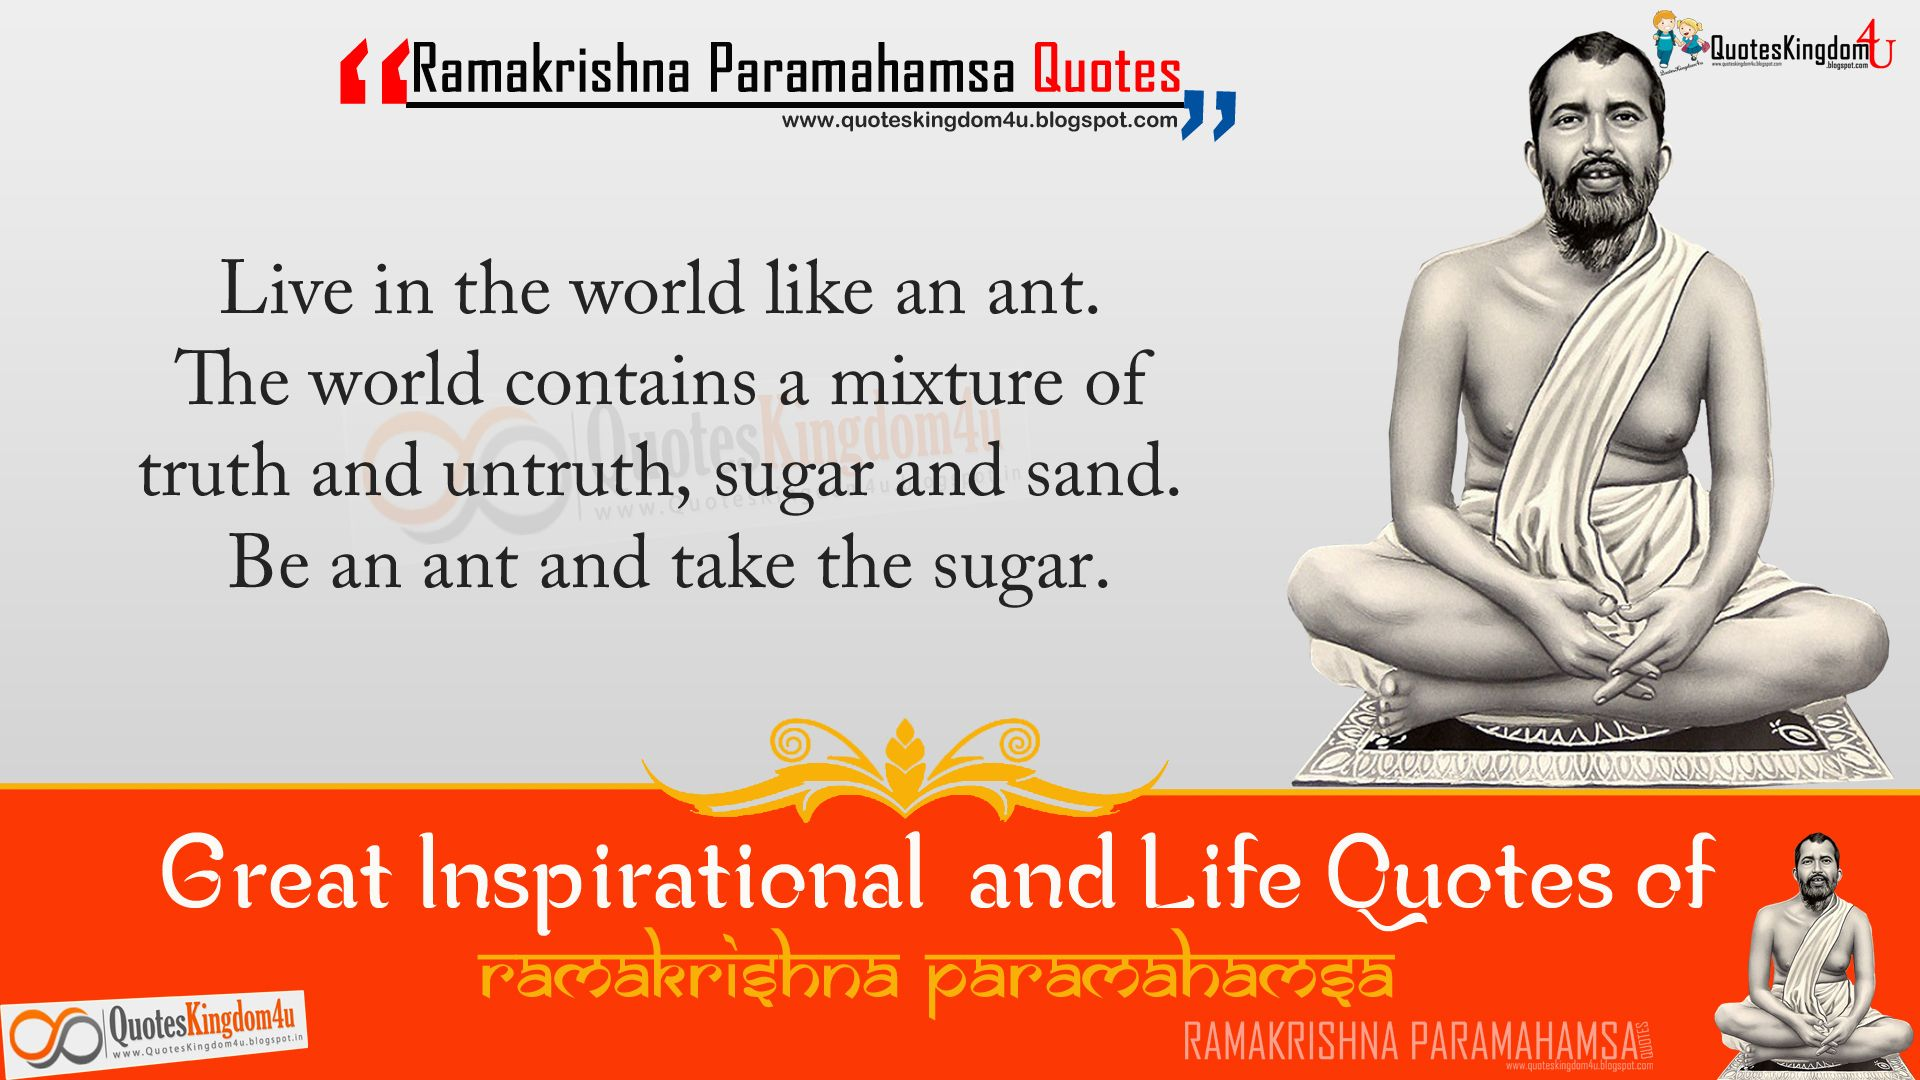 Essay on ramakrishna paramahamsa